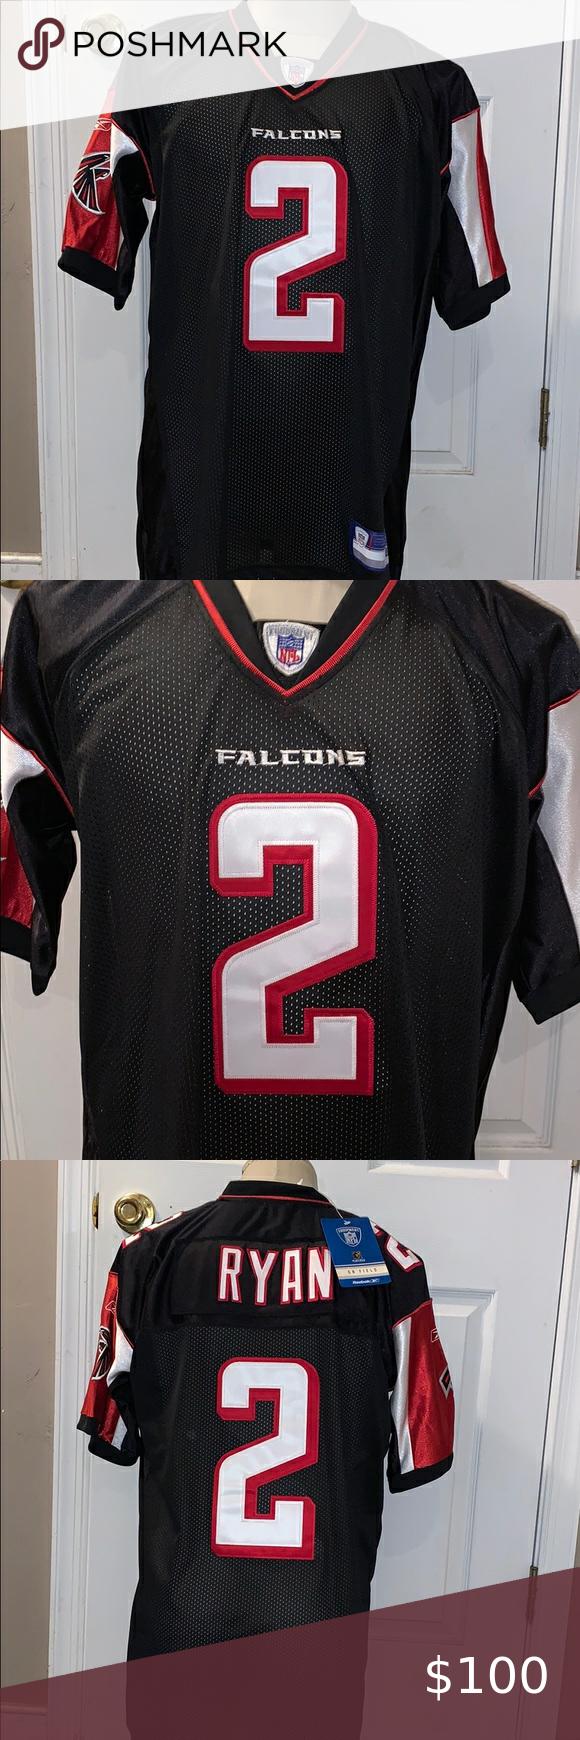 Vintage Nfl Atl Falcons Matt Ryan Jersey In 2020 Nfl Shirts Nfl Vintage